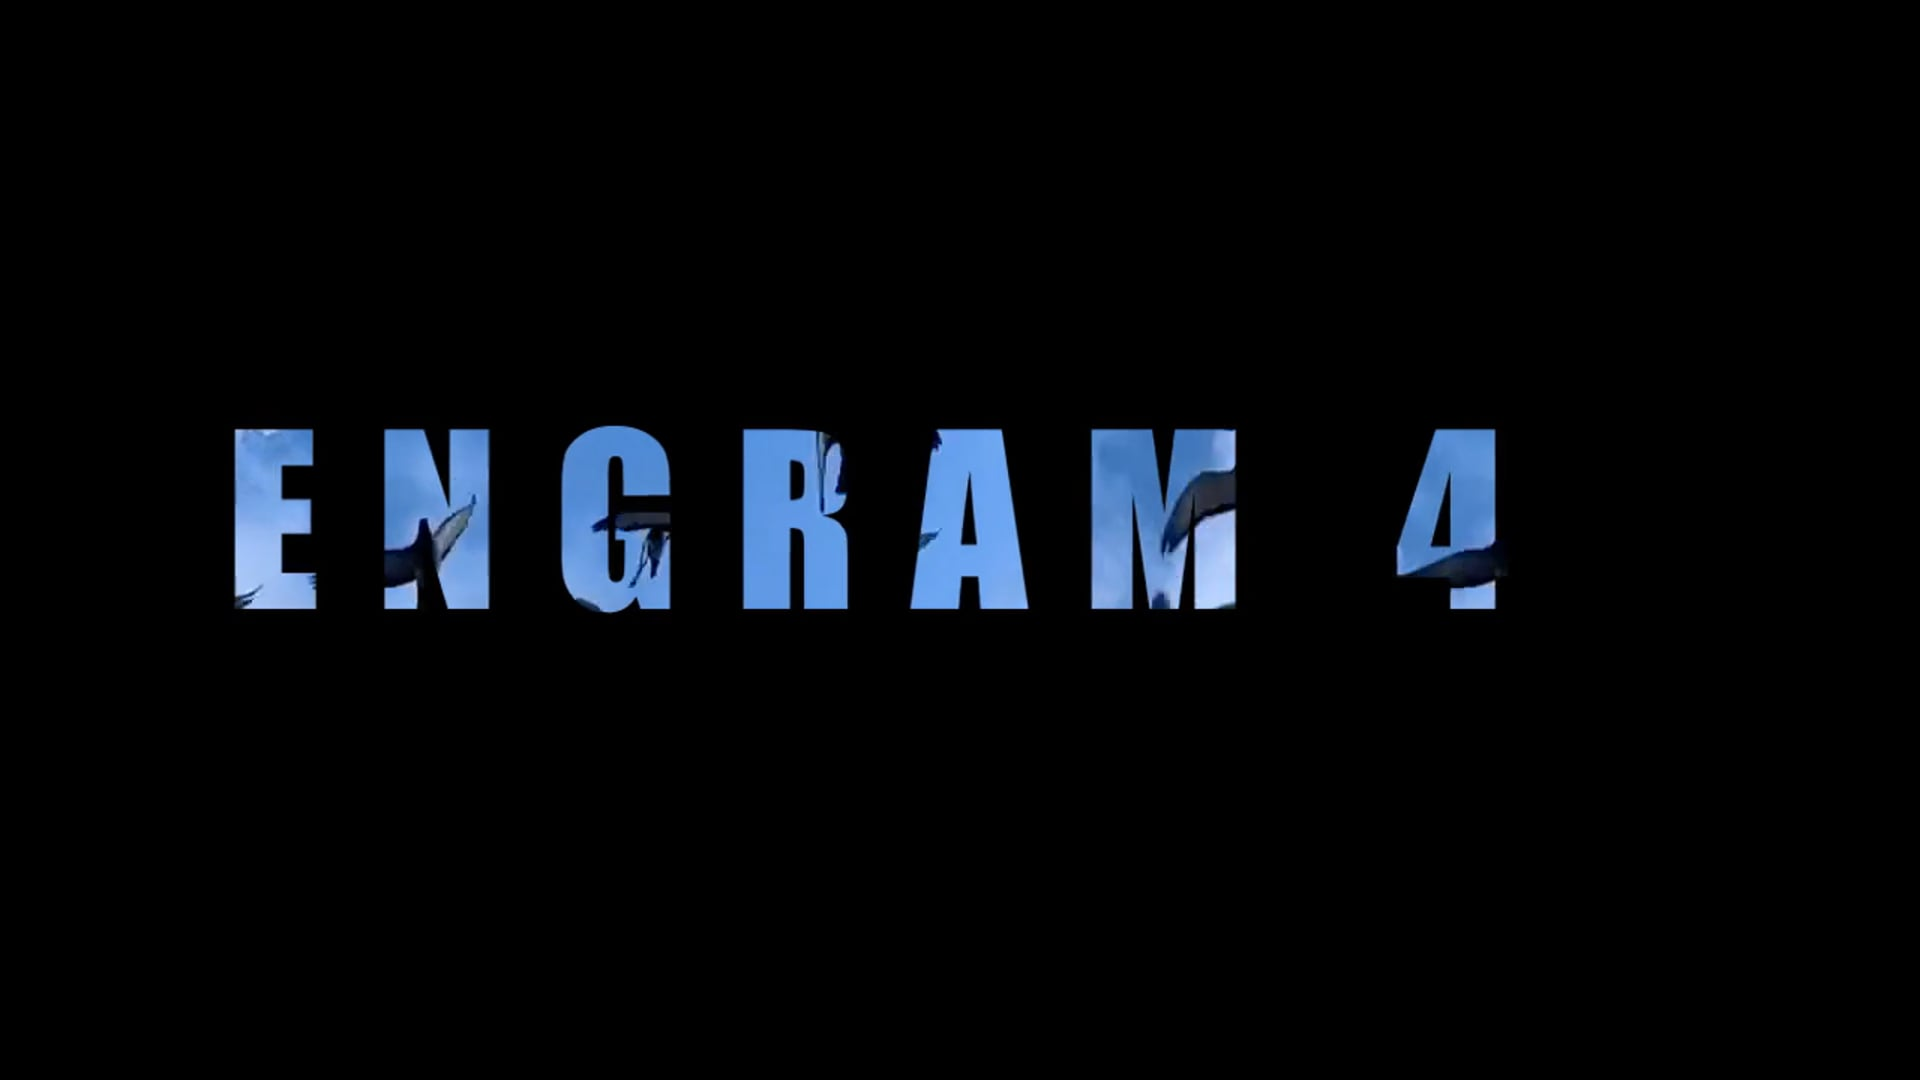 ENGRAM 4 (Teaser)